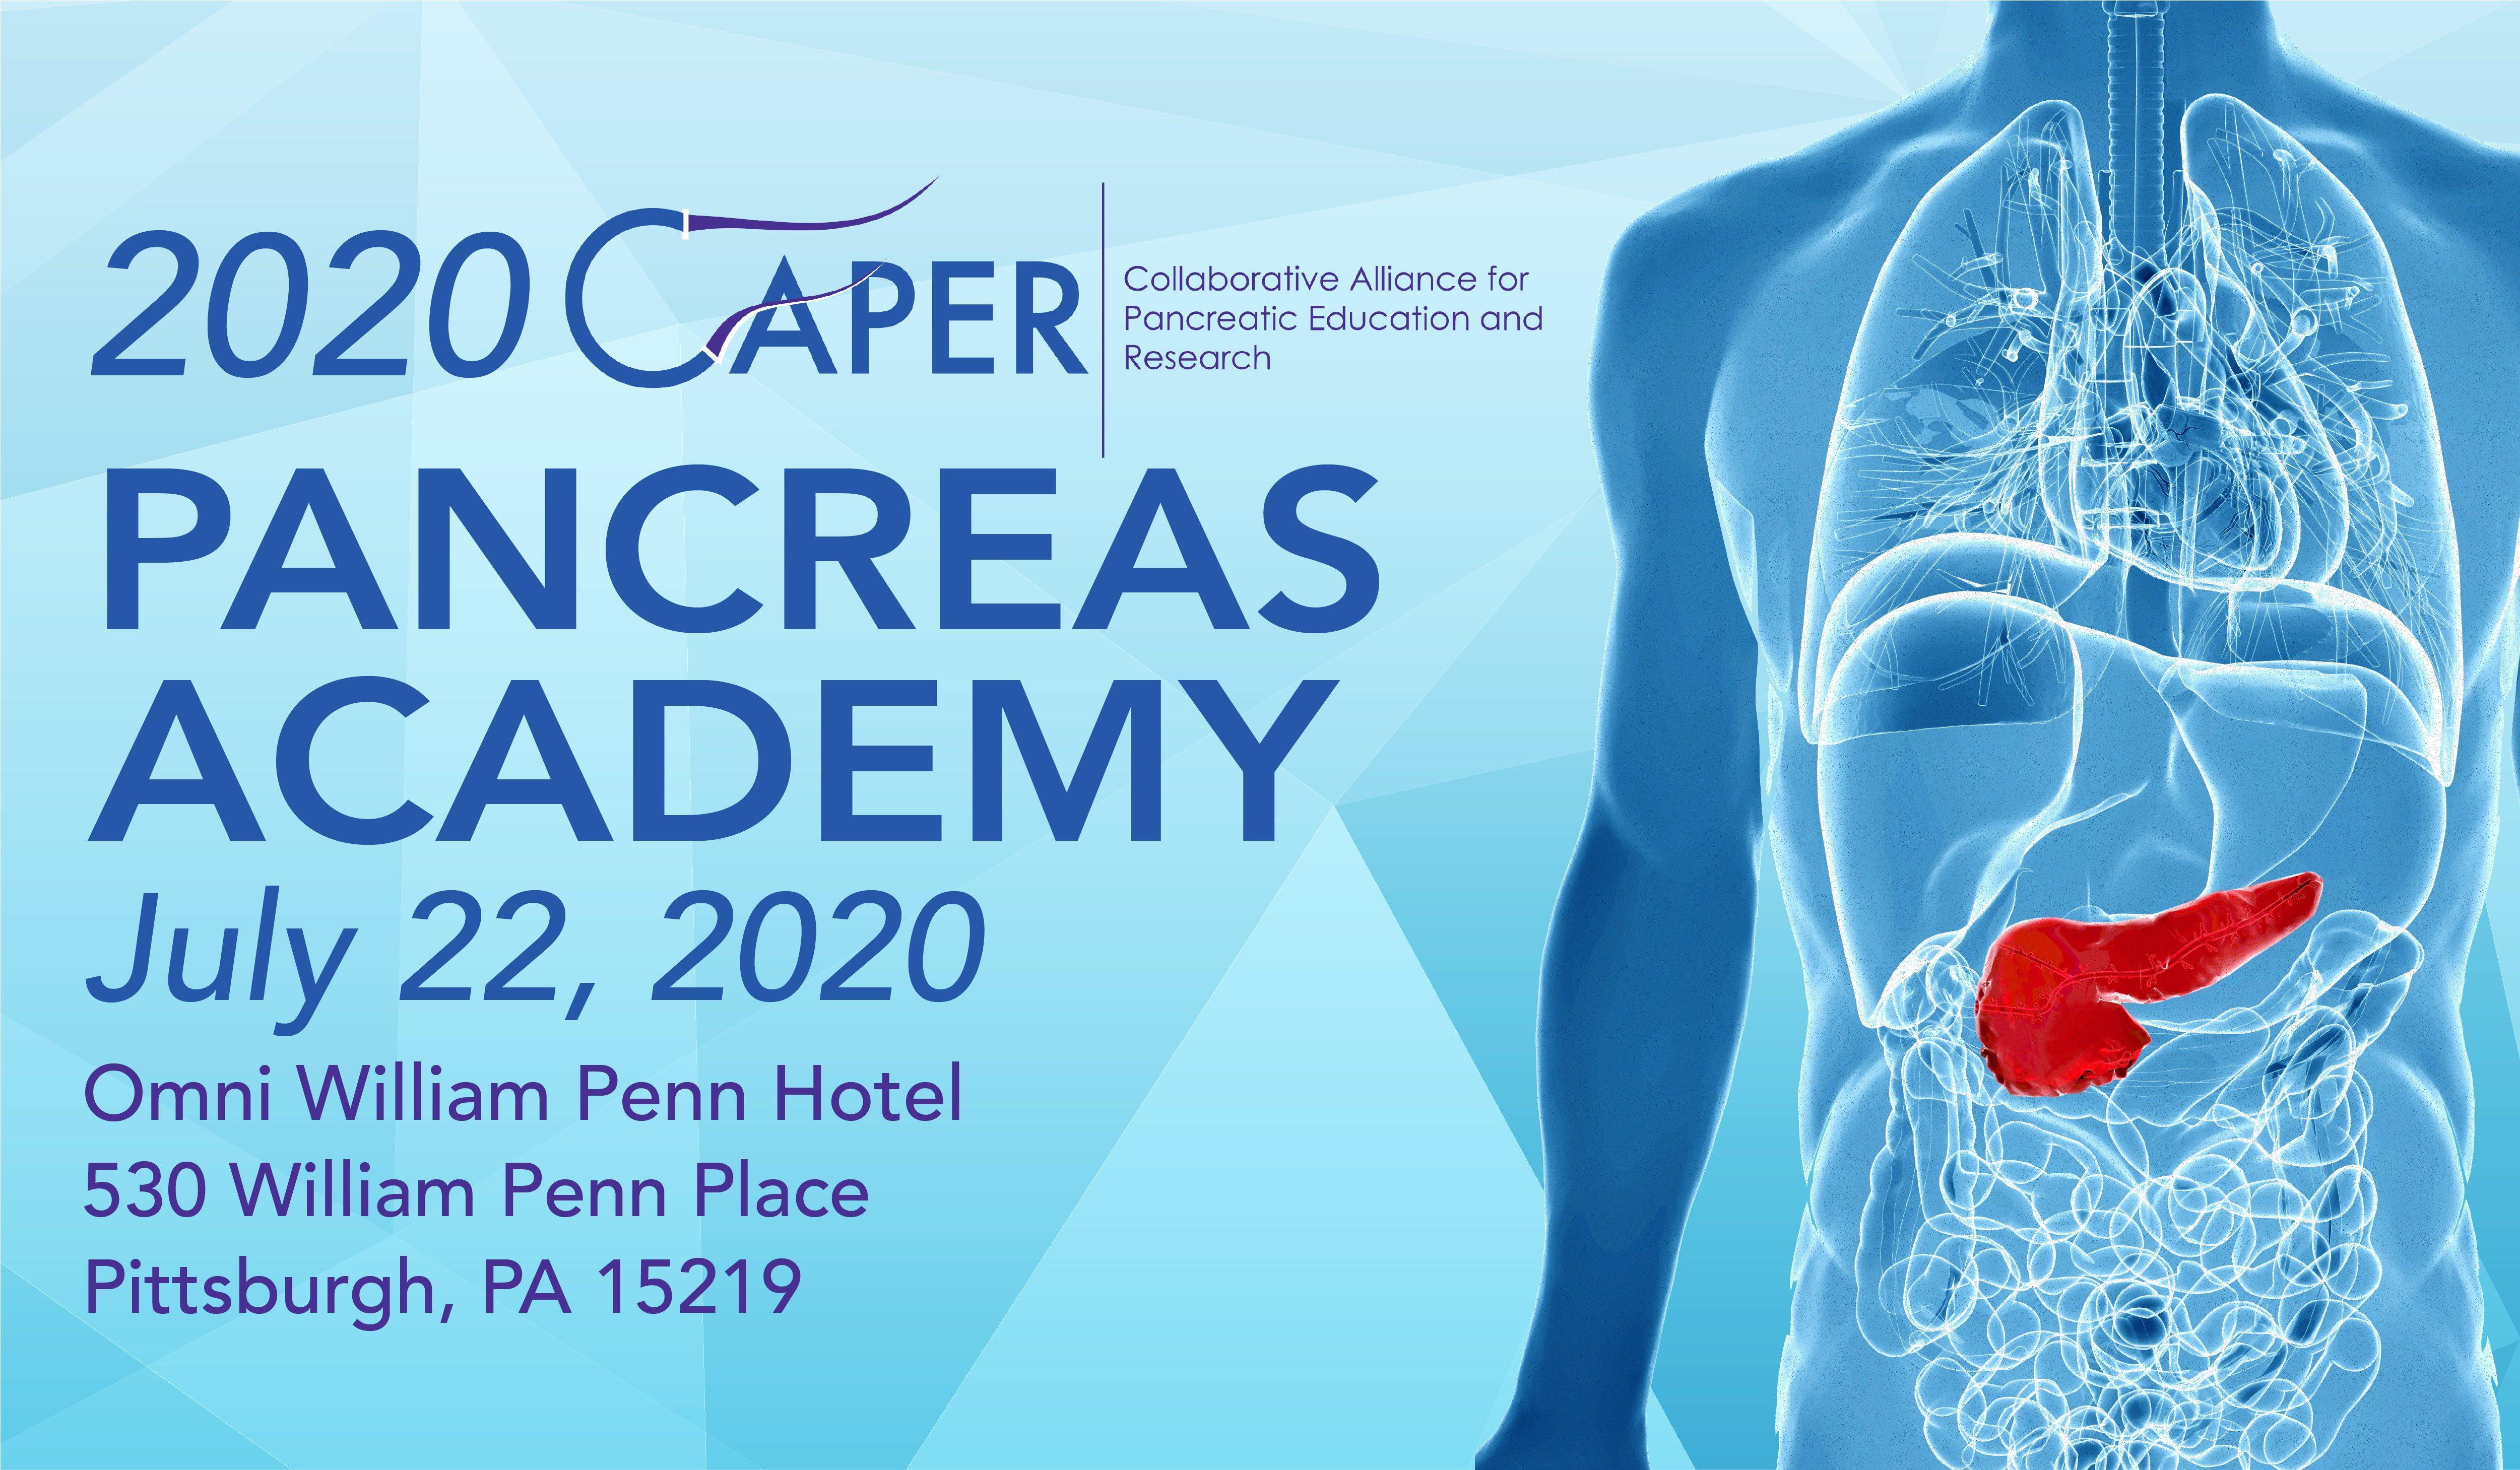 2020 CAPER Pancreas Academy